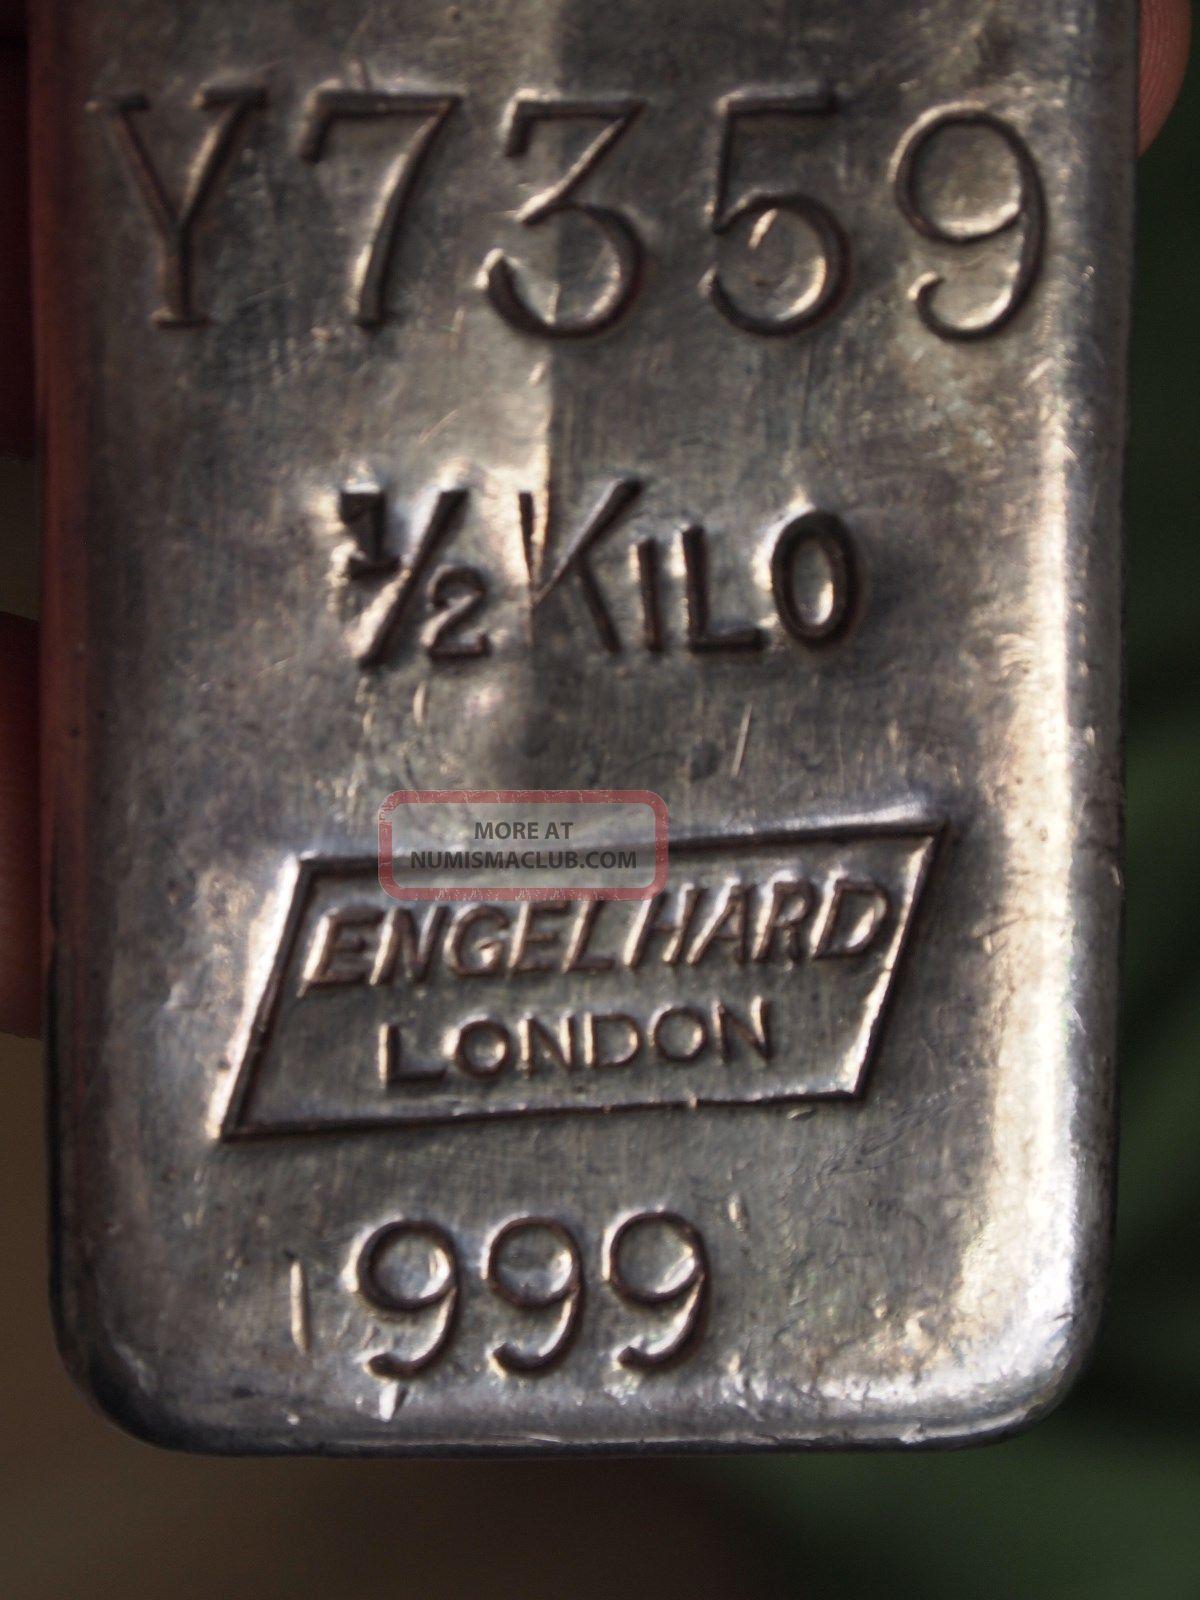 Engelhard London 189 Kilo Old Pour Silver Bar 999 1000 Rare